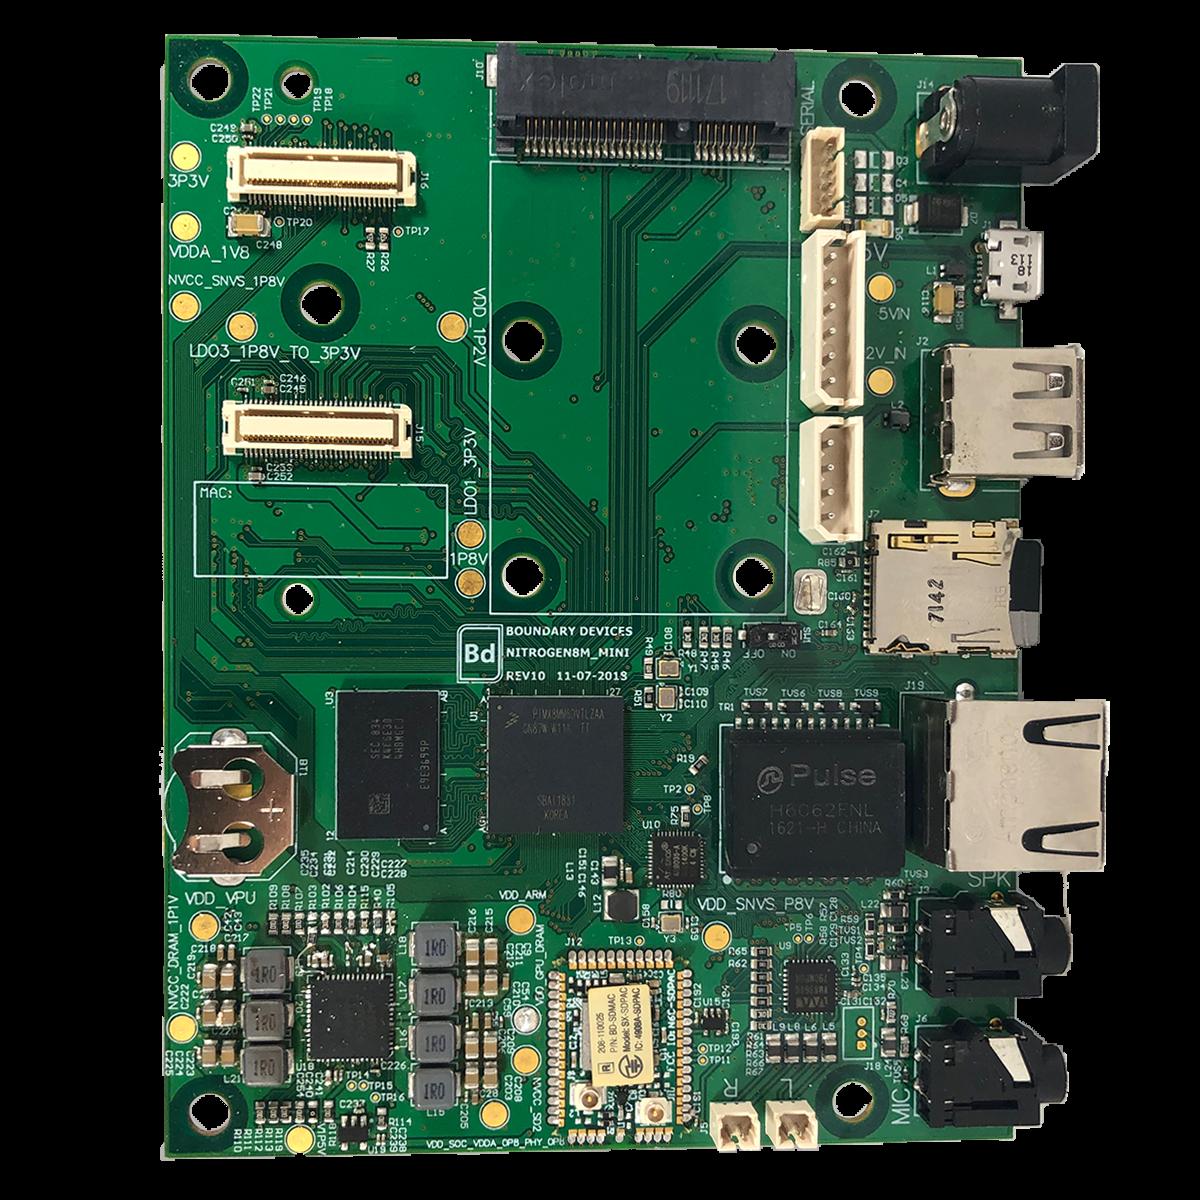 Nitrogen8M_Mini SBC